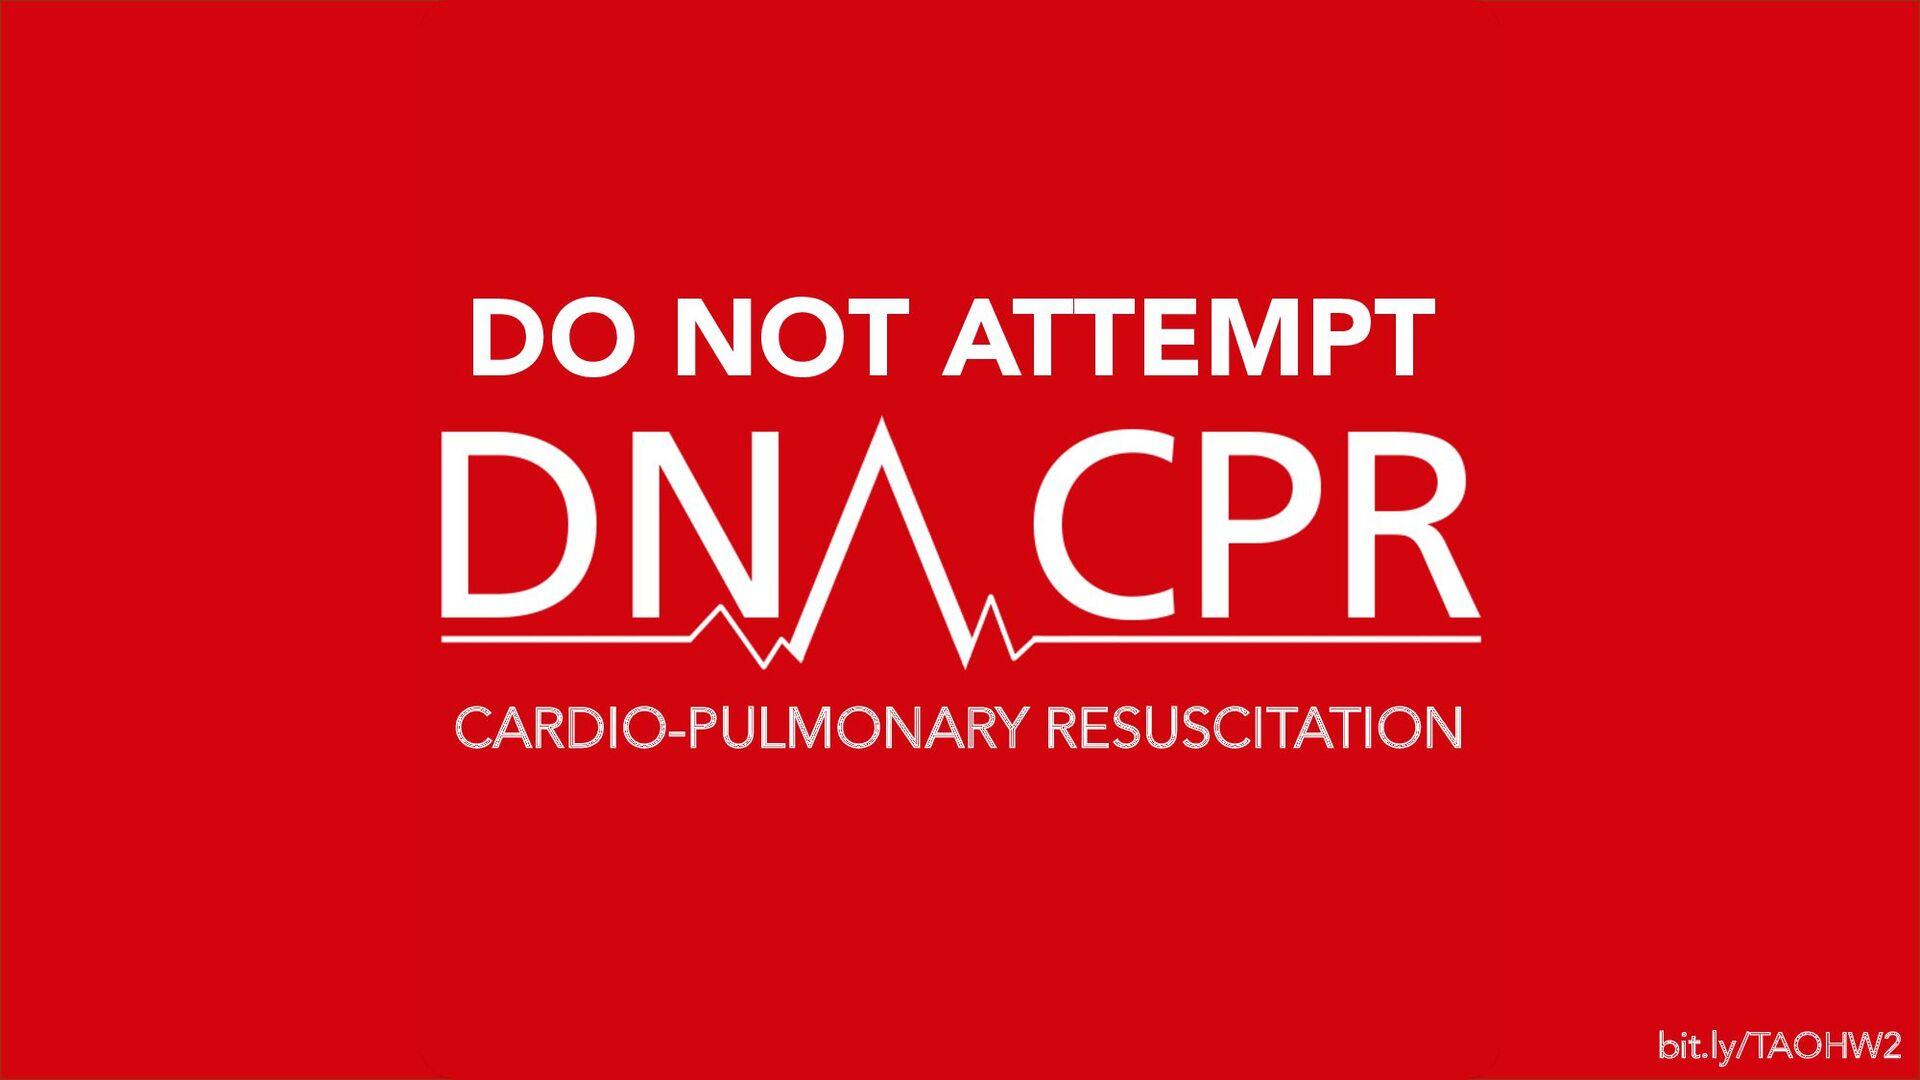 CARDIO-PULMONARY RESUSCITATION DO NOT ATTEMPT b...